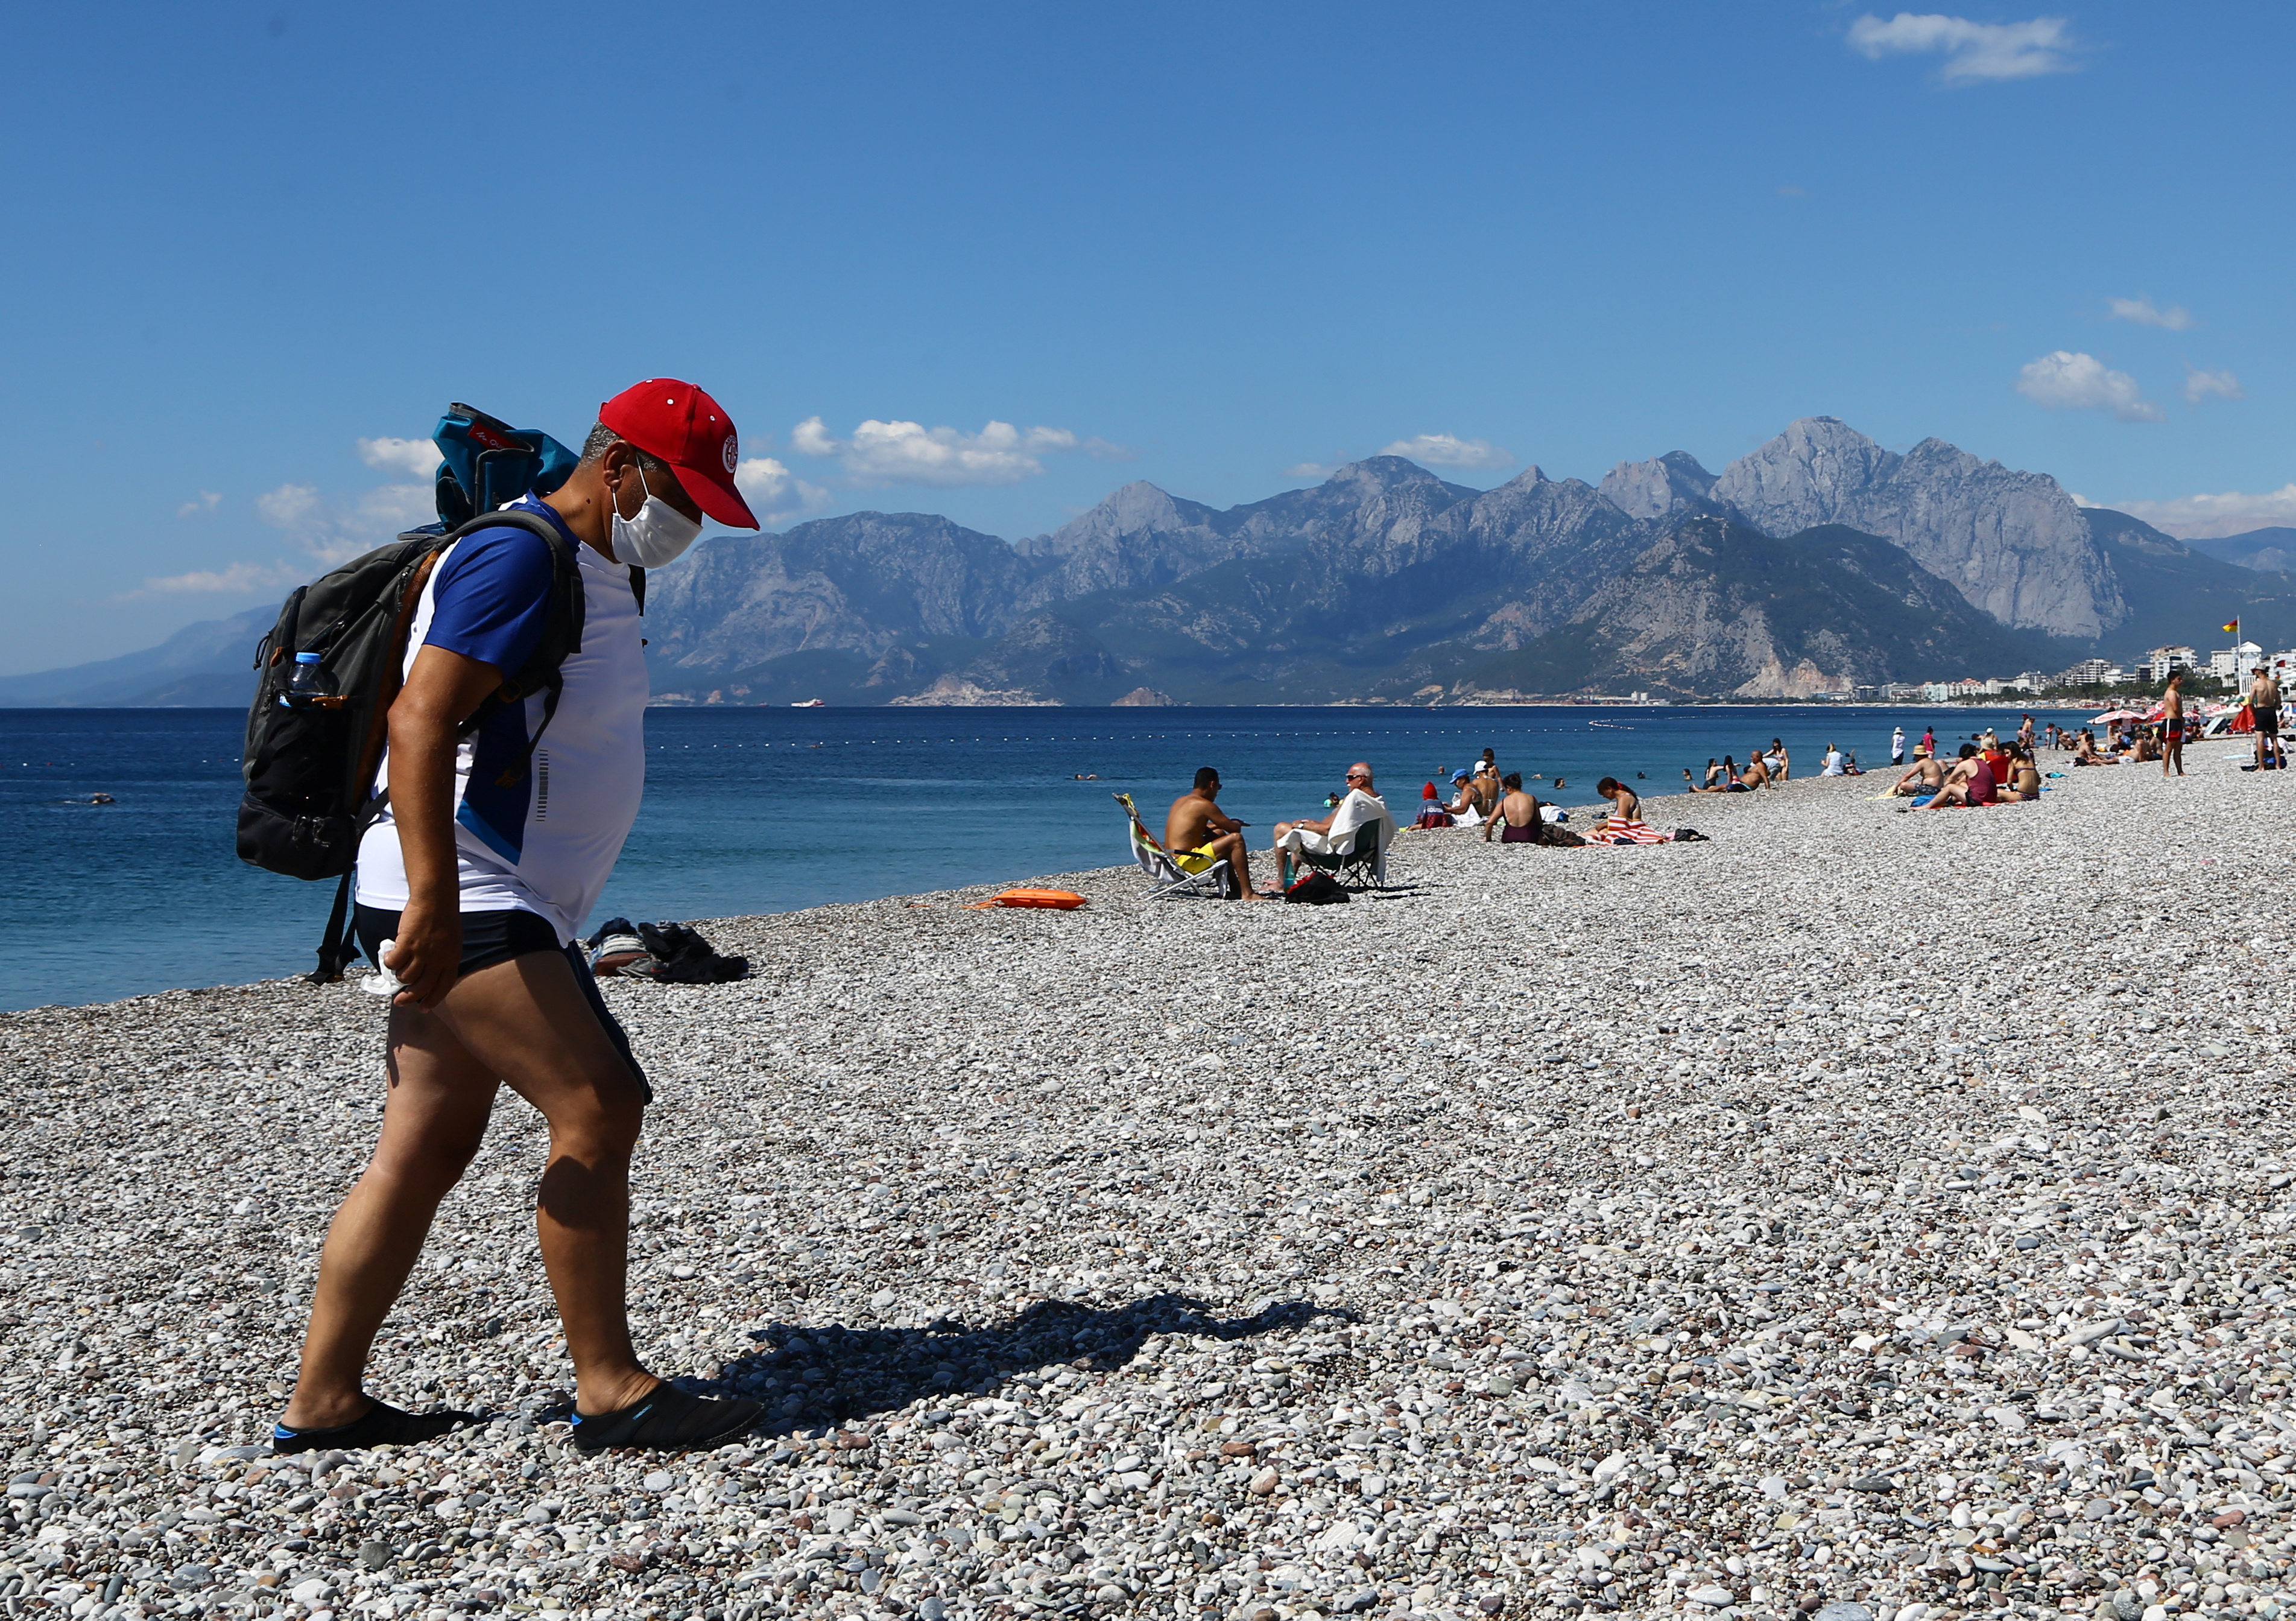 Мэр популярного турецкого курорта впал в кому из-за коронавируса